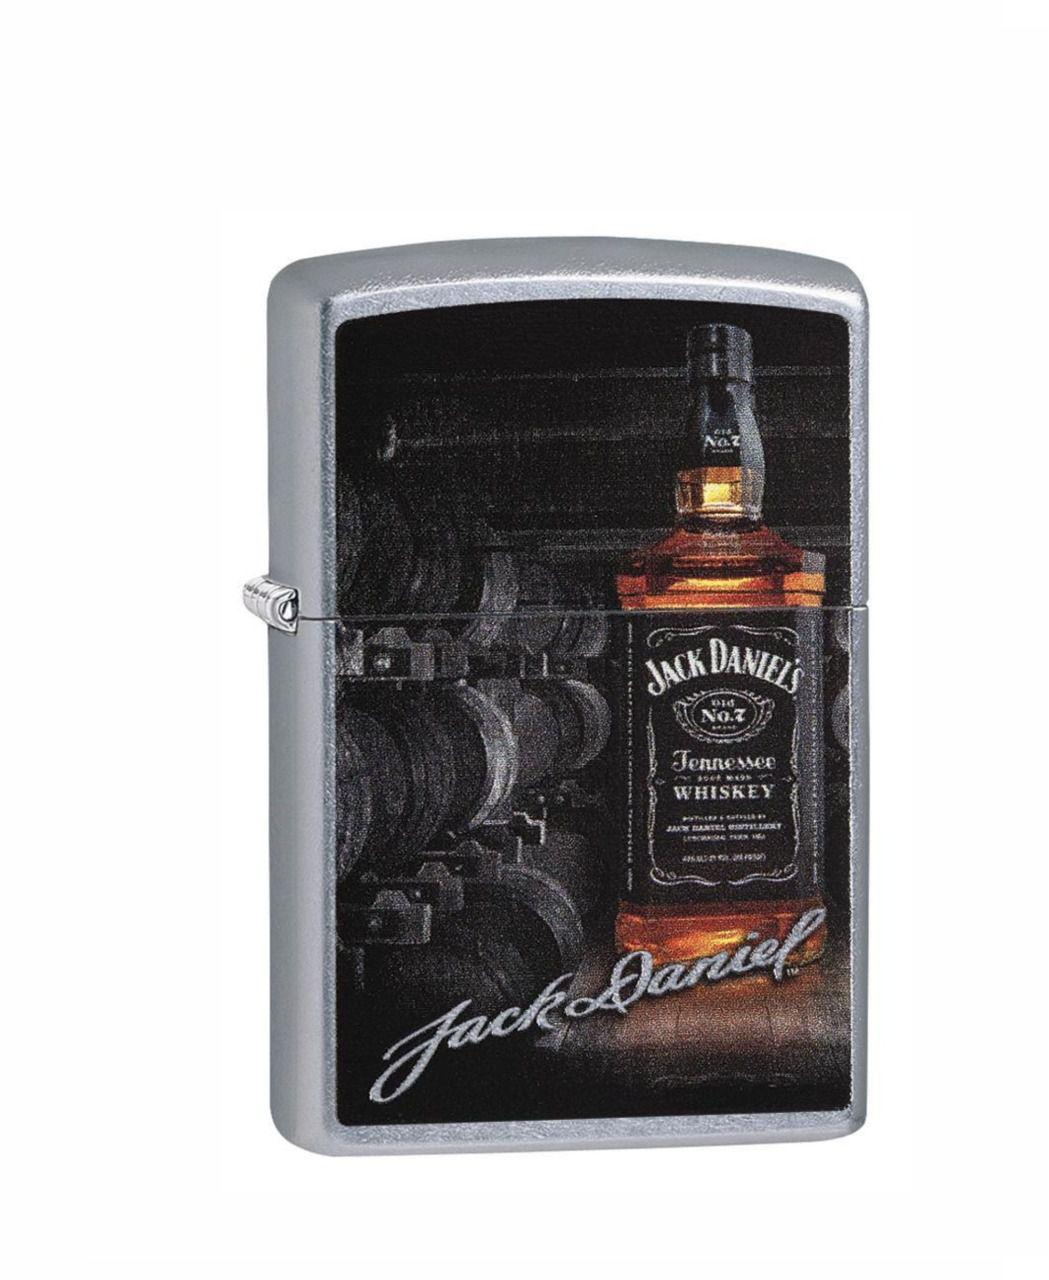 Isqueiro Zippo Classic Jack Daniel's Tennes